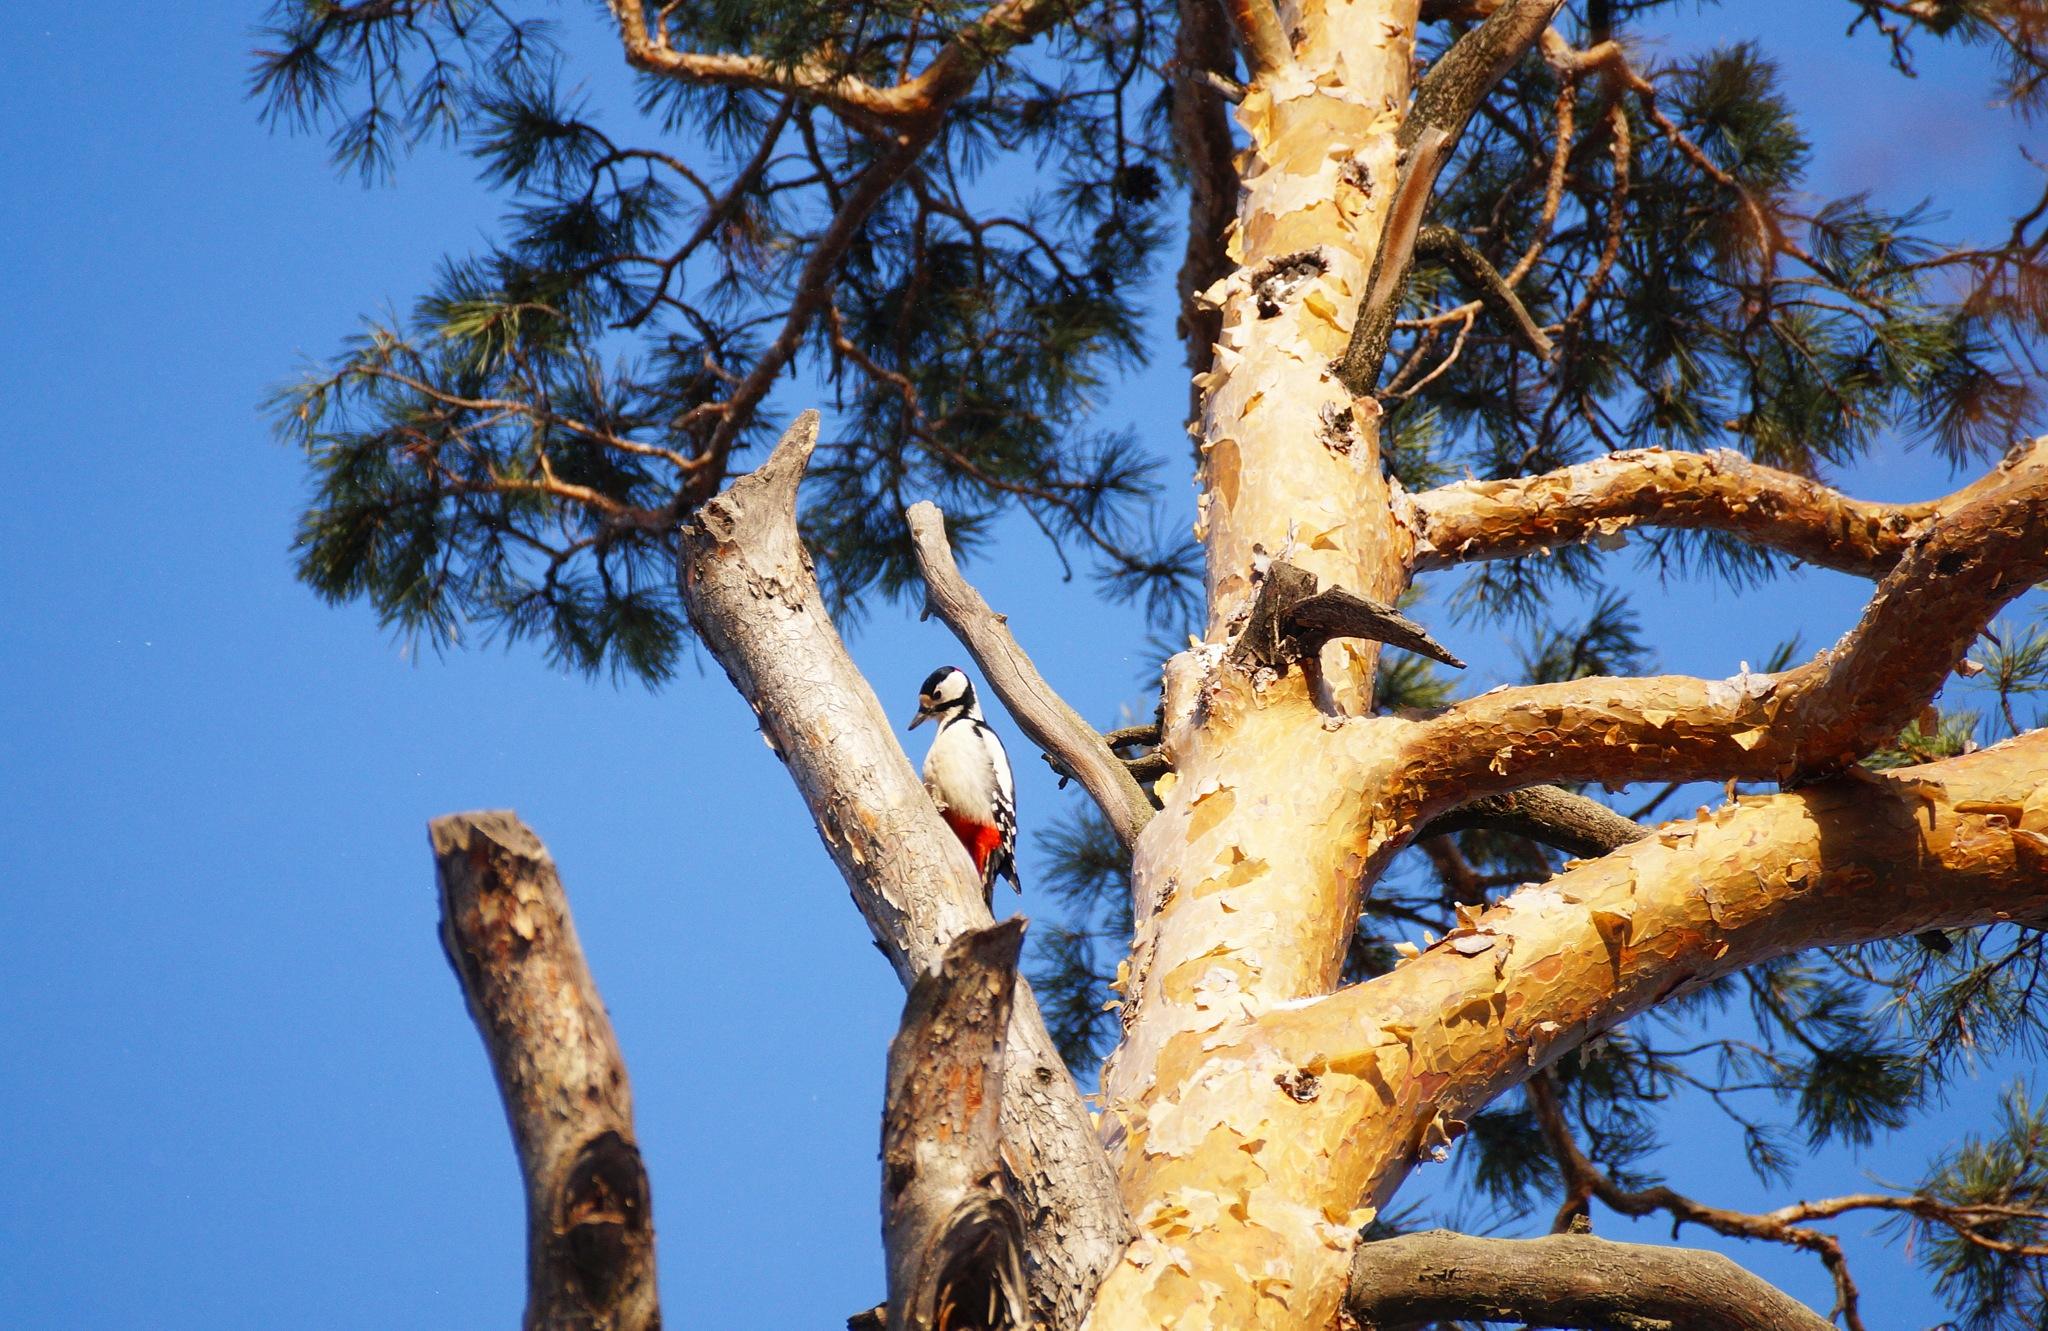 spotted woodpecker by Veronika  Parfenyuk